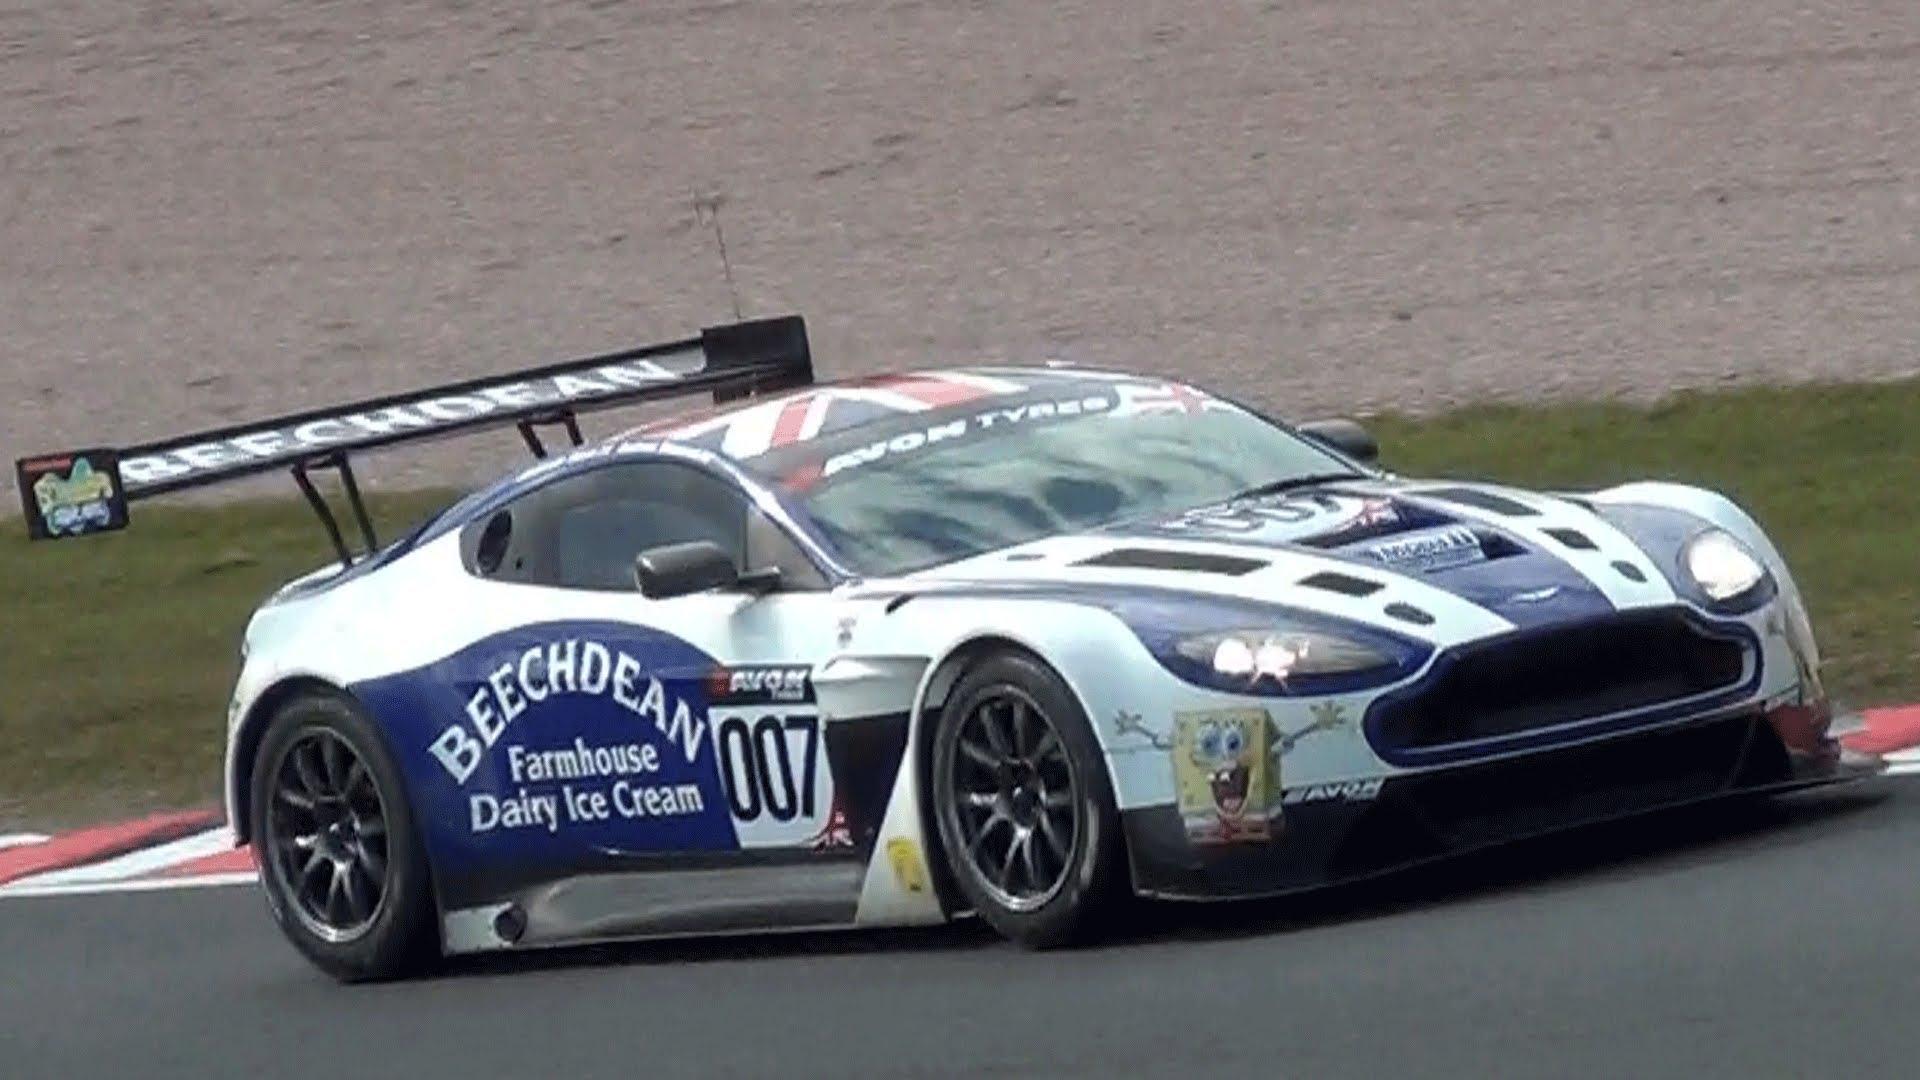 Aston Martin Vantage GT3 Pics, Vehicles Collection